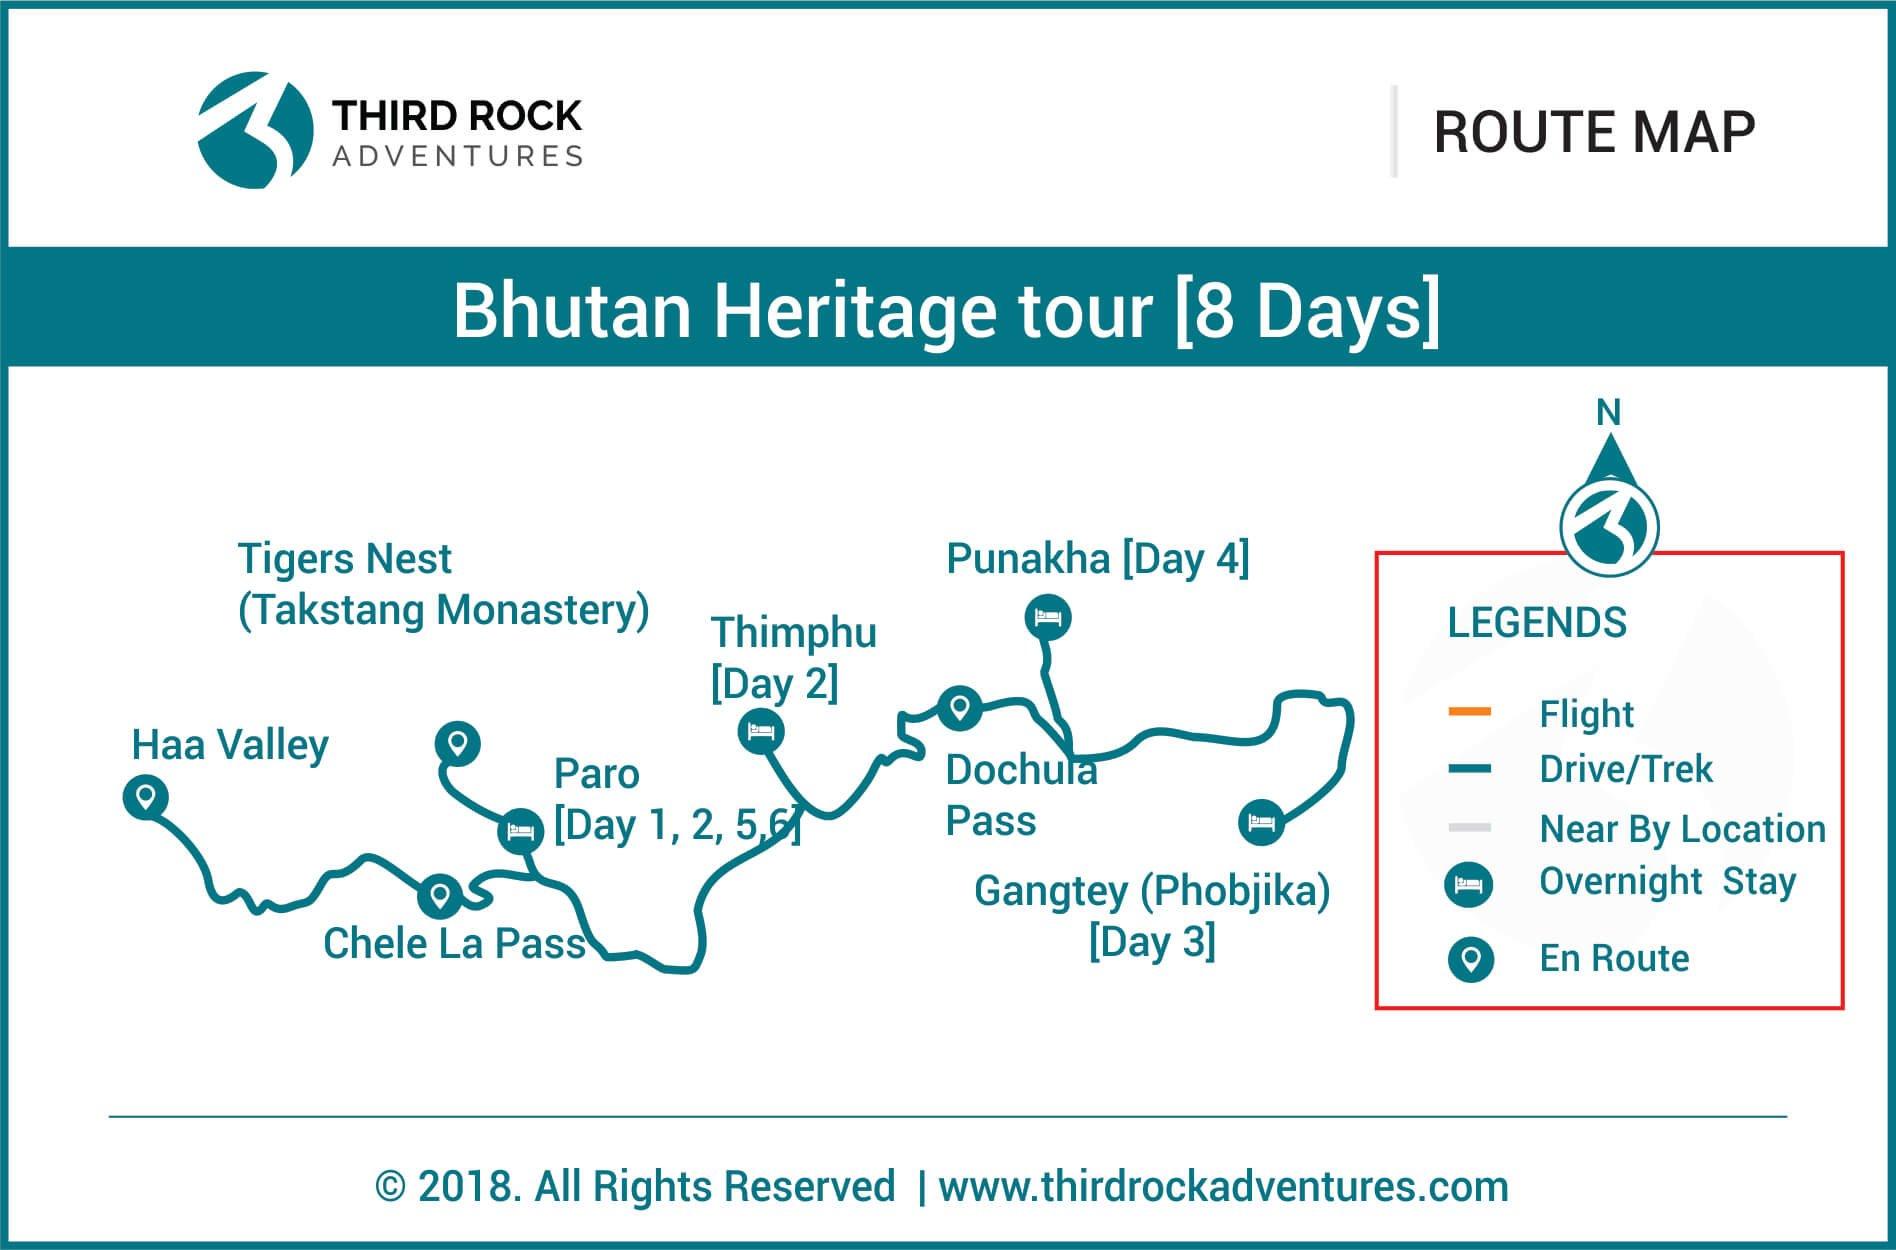 Bhutan Heritage Tour 8 days Route Map